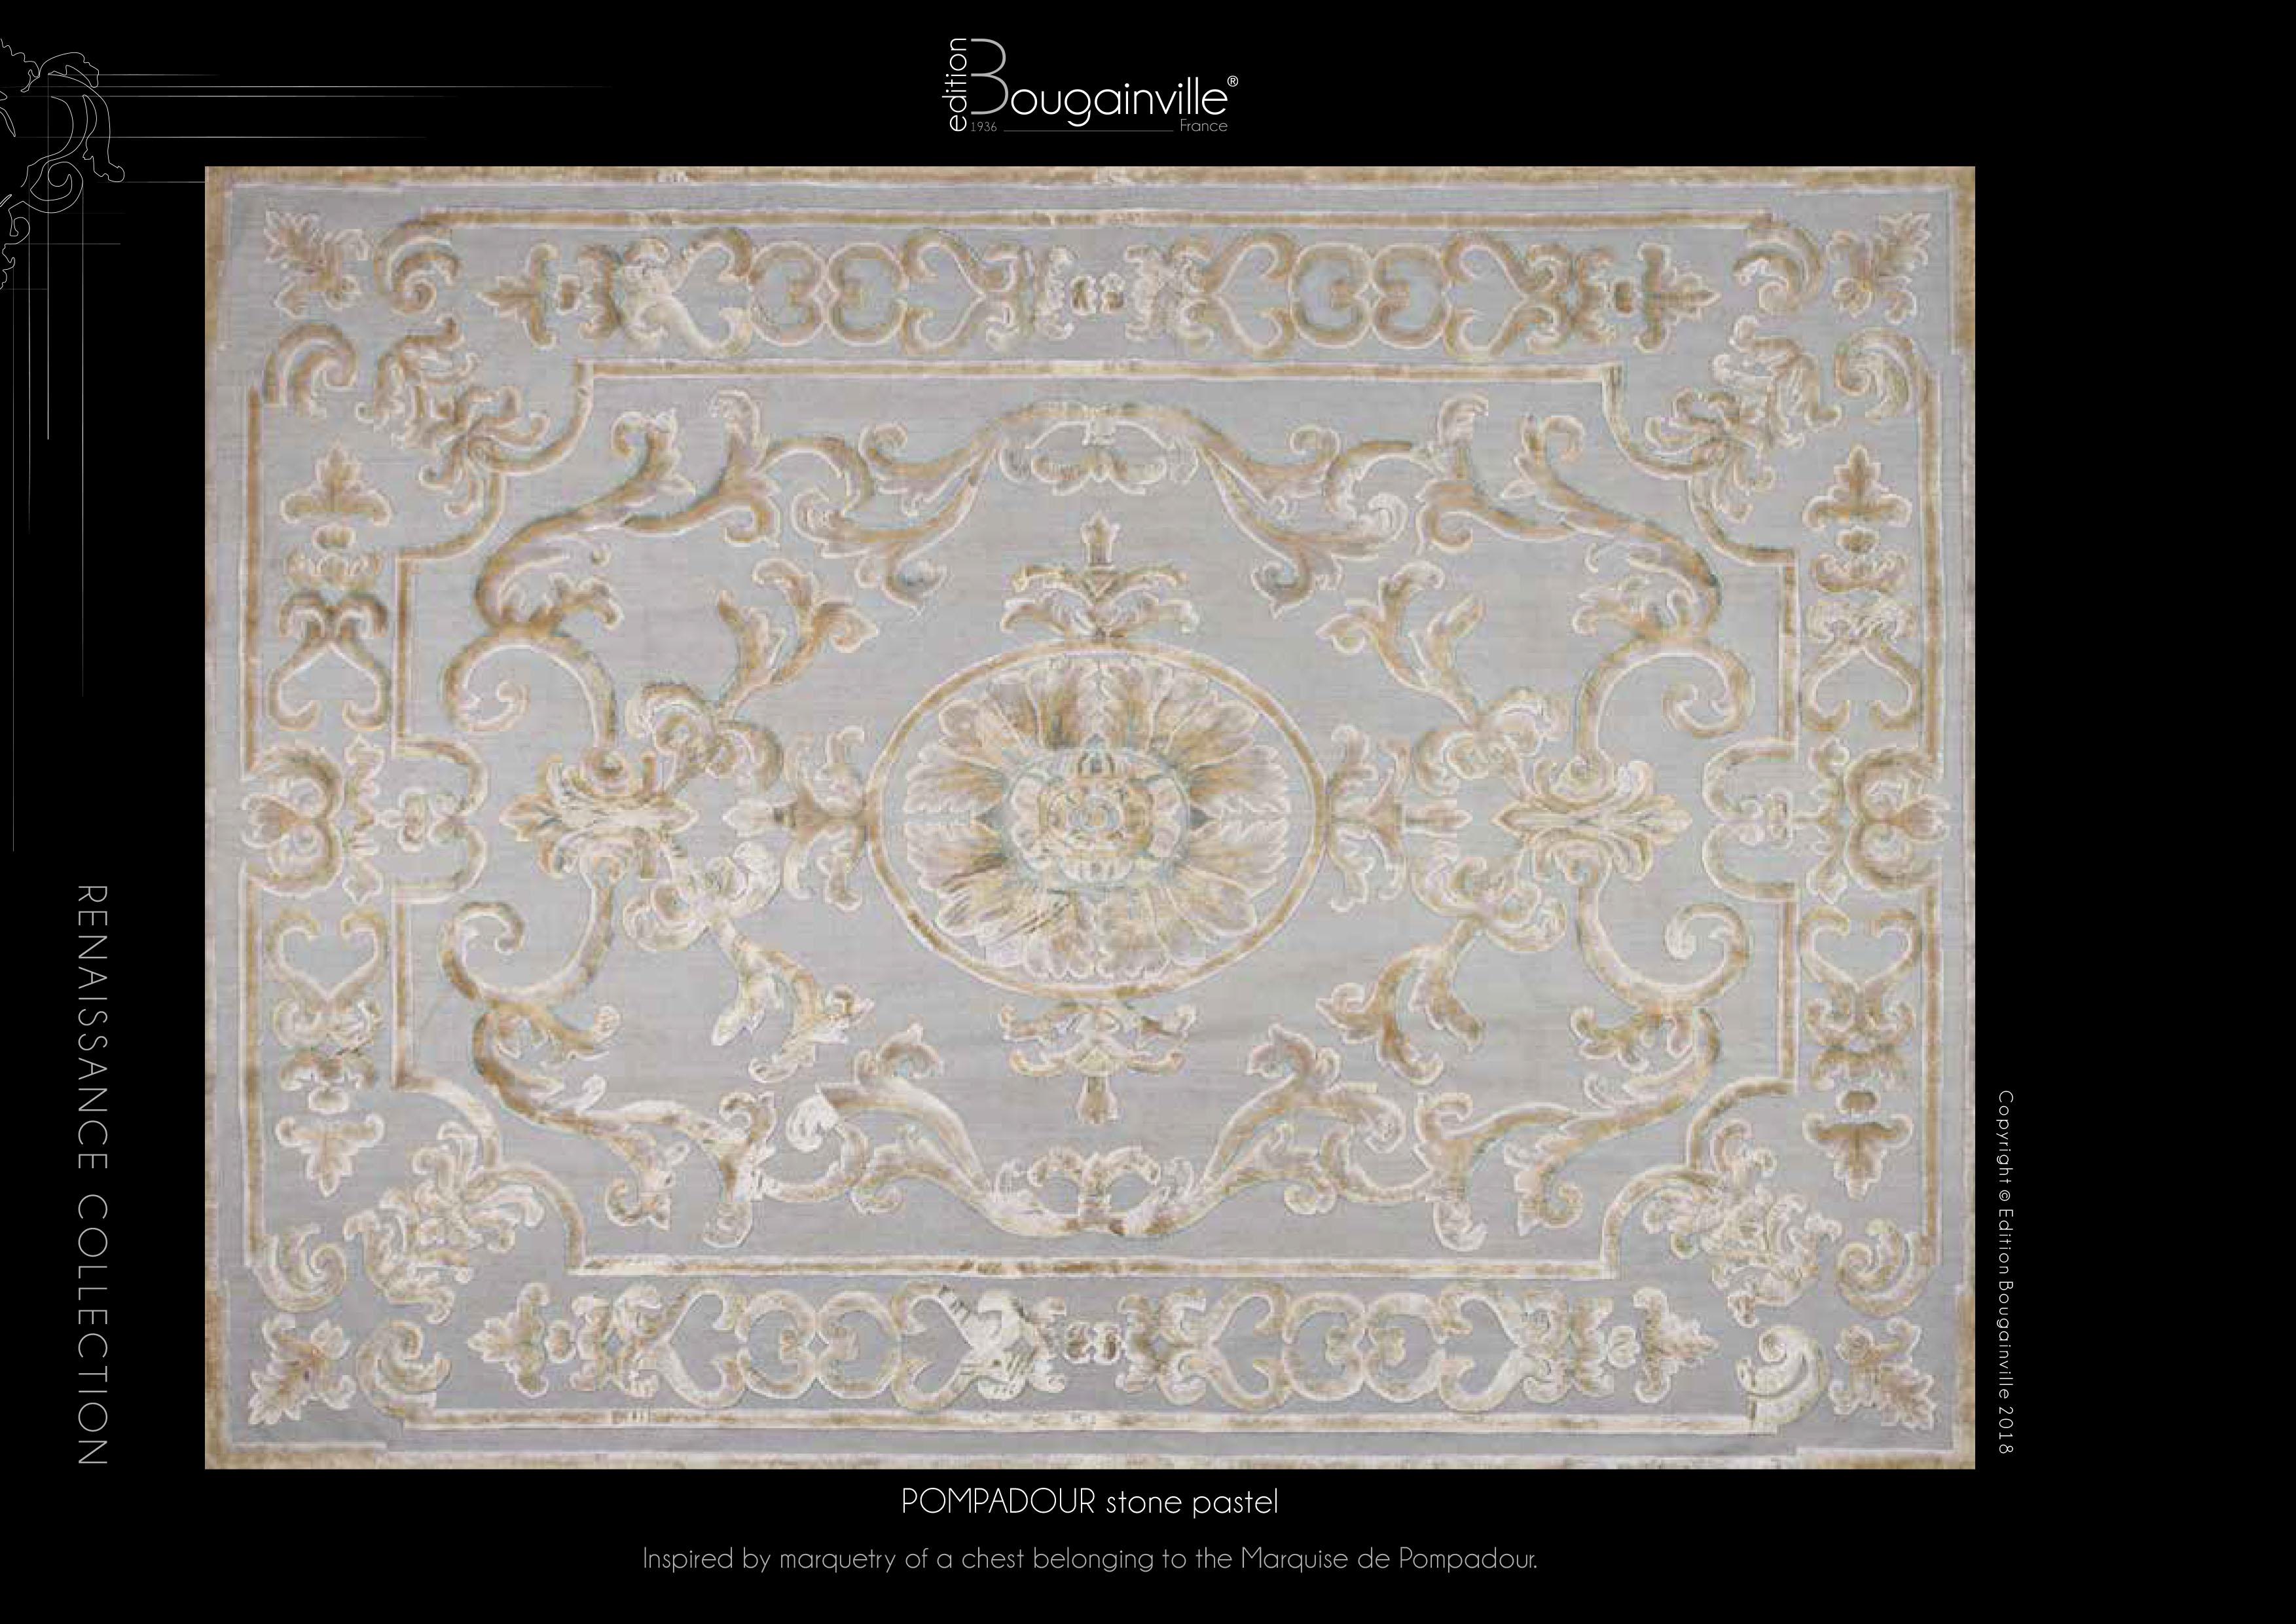 Ковер Edition Bougainville, POMPADOUR stone pastel